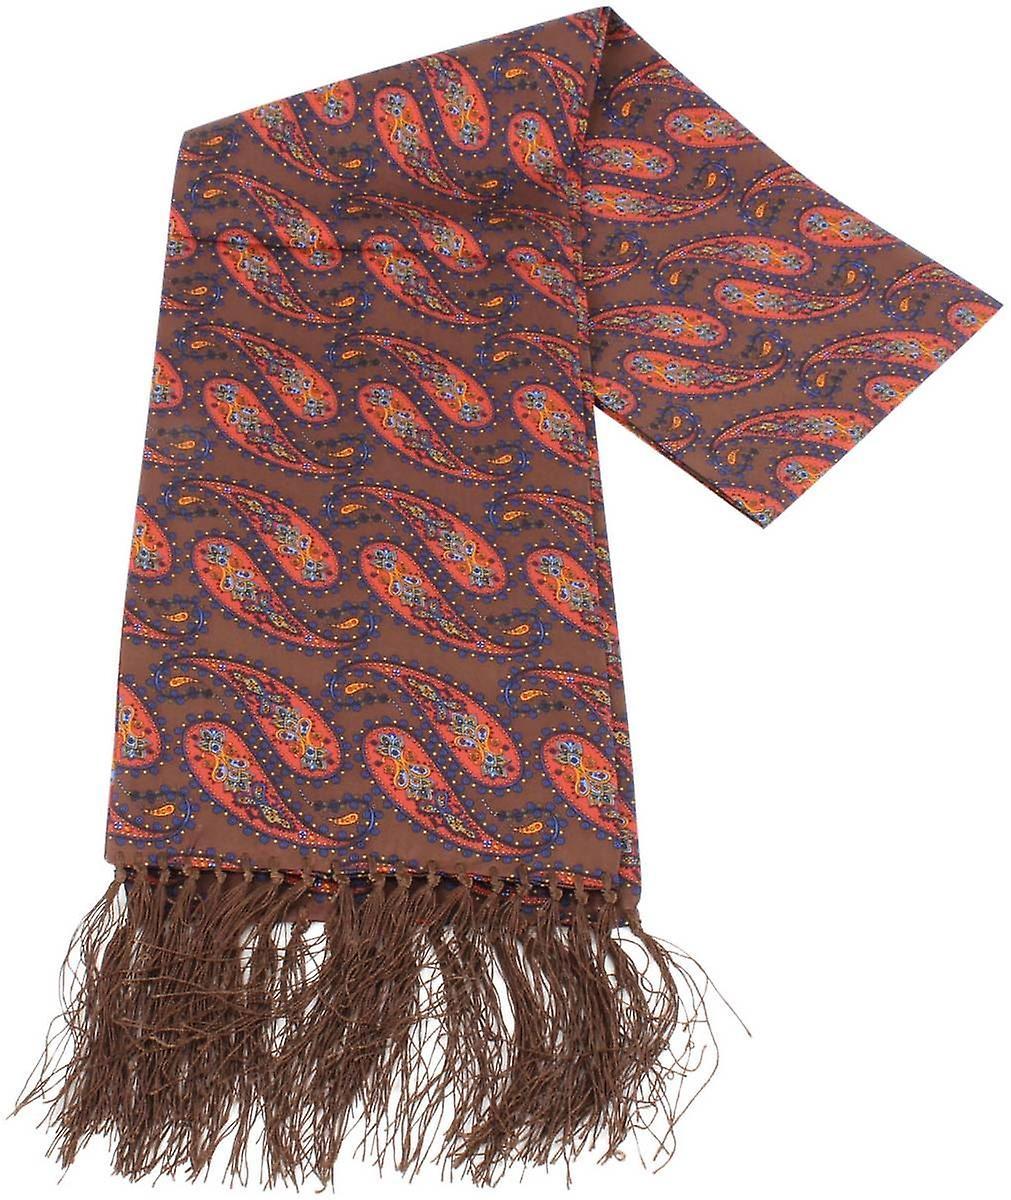 Knightsbridge Neckwear Paisley Silk Scarf - marron Orange